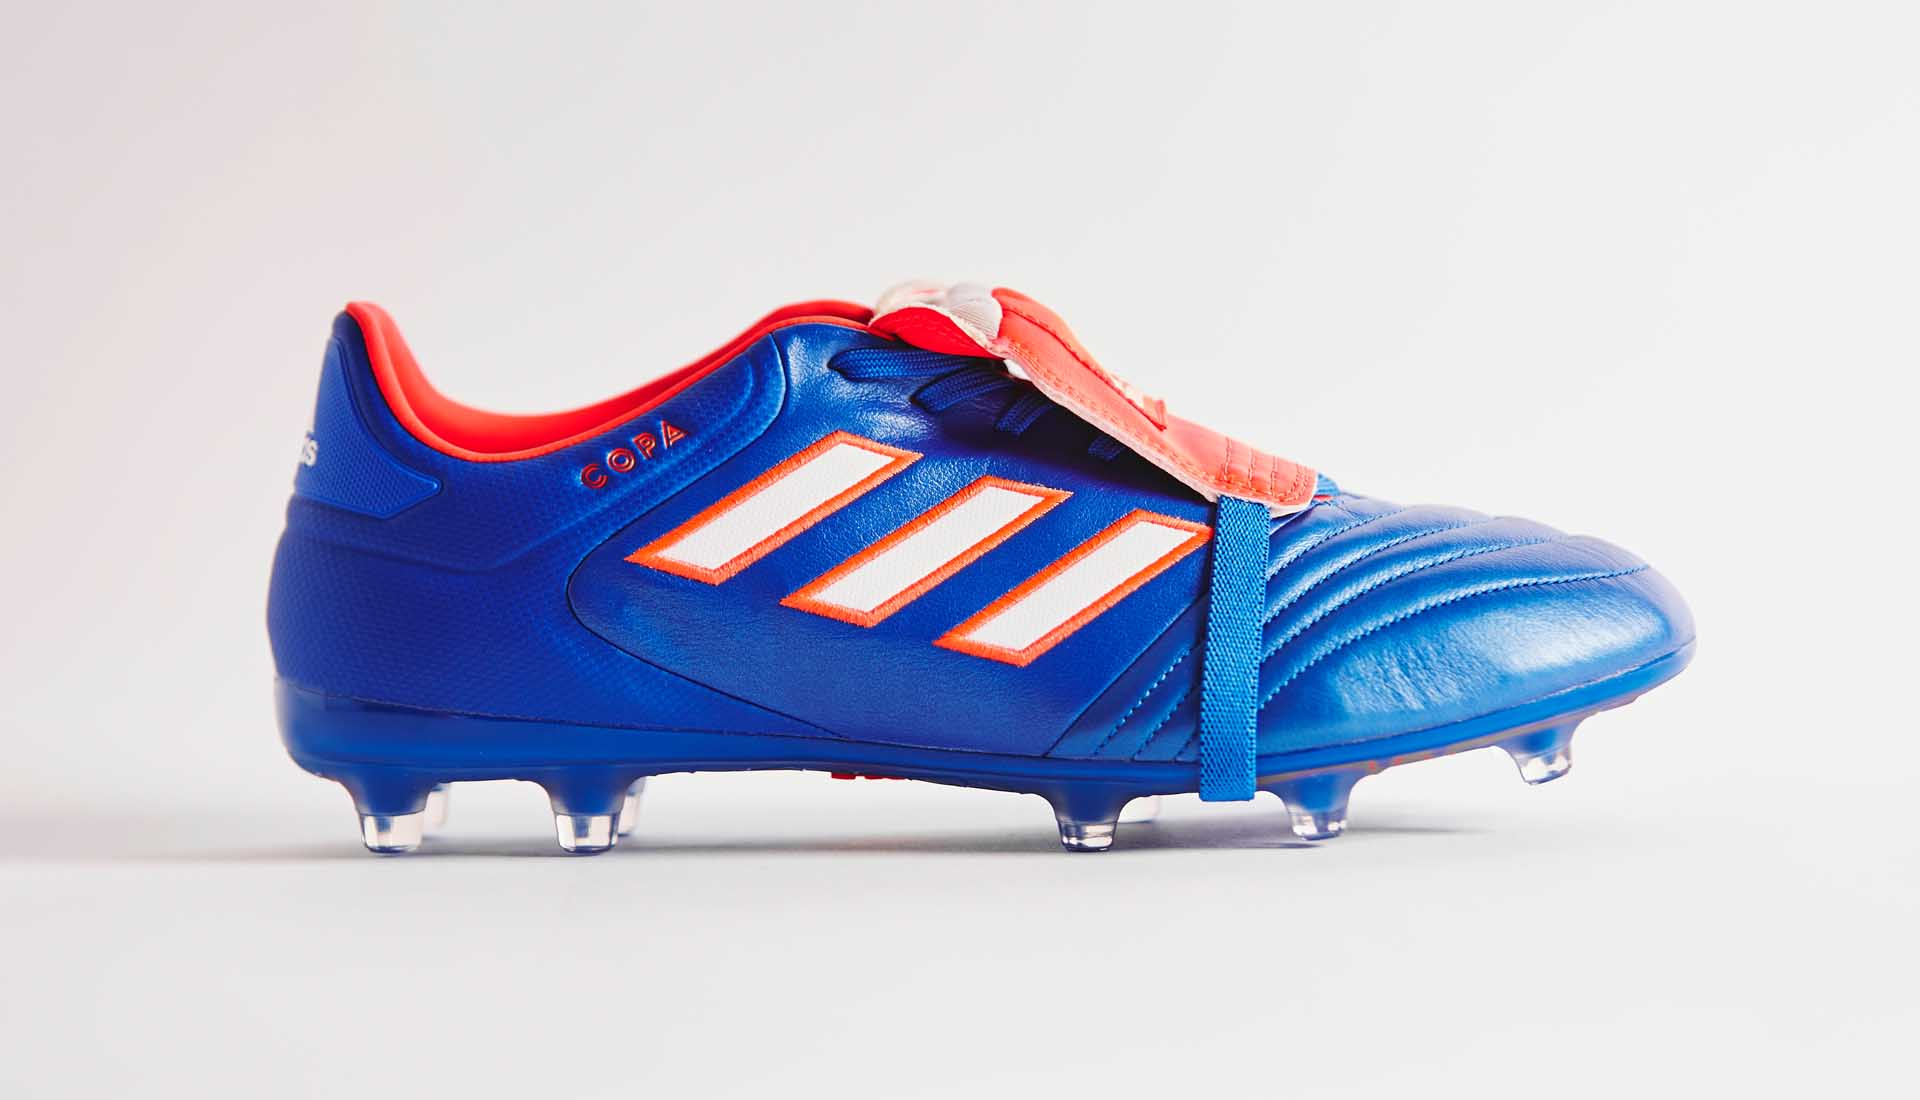 the latest 10933 9989f adidas-copa-gloro-17-blue-red-1-min.